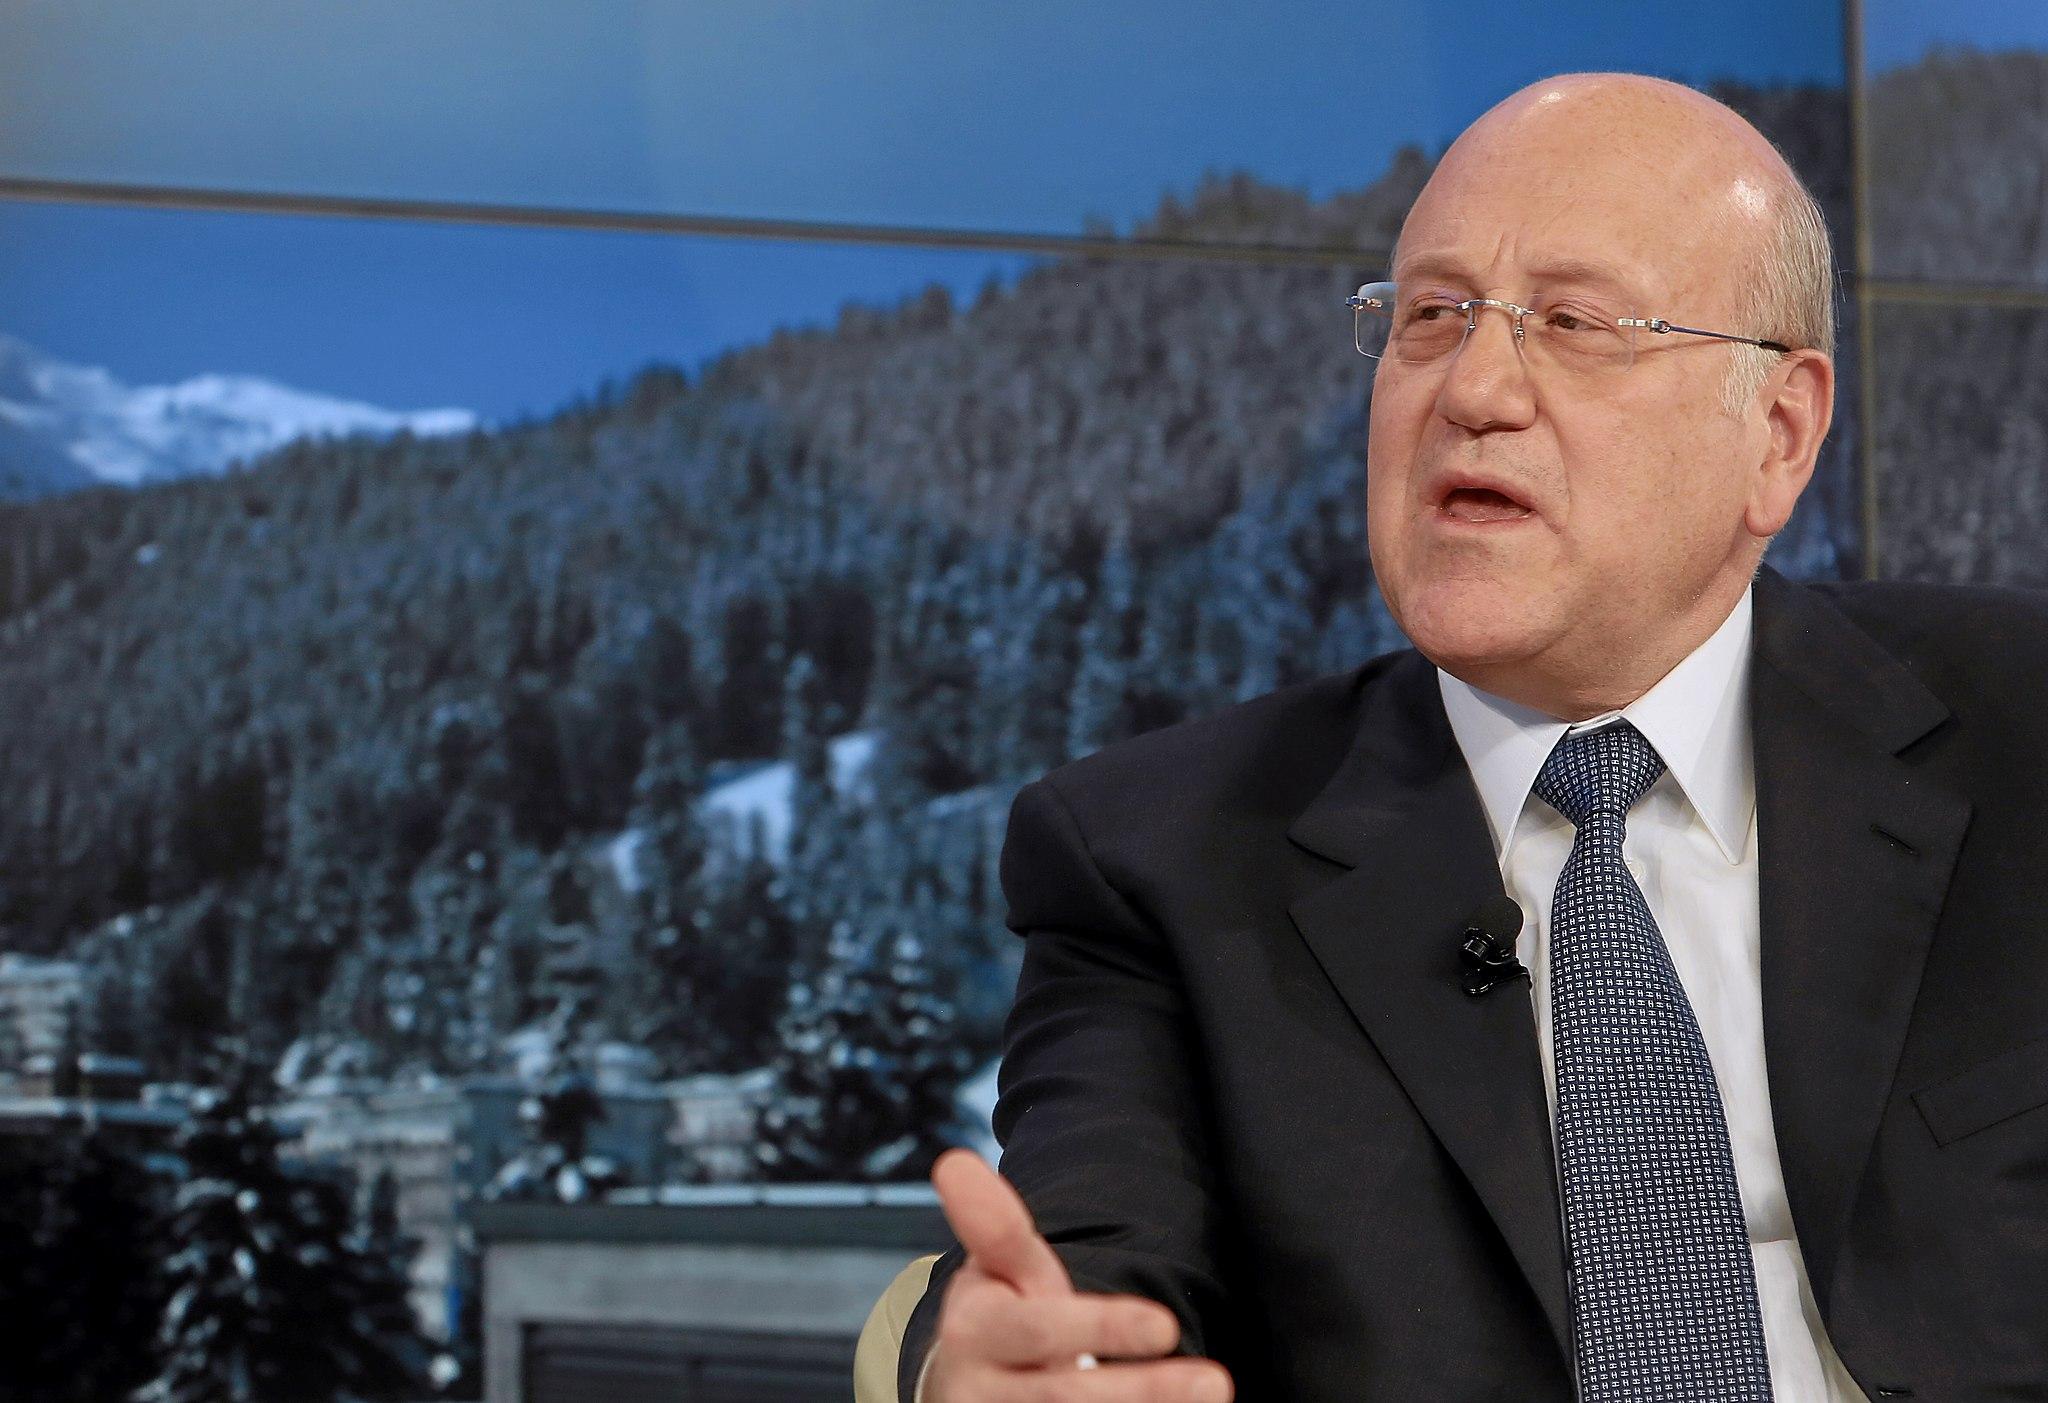 Lebanon chooses billionaire as next prime minister